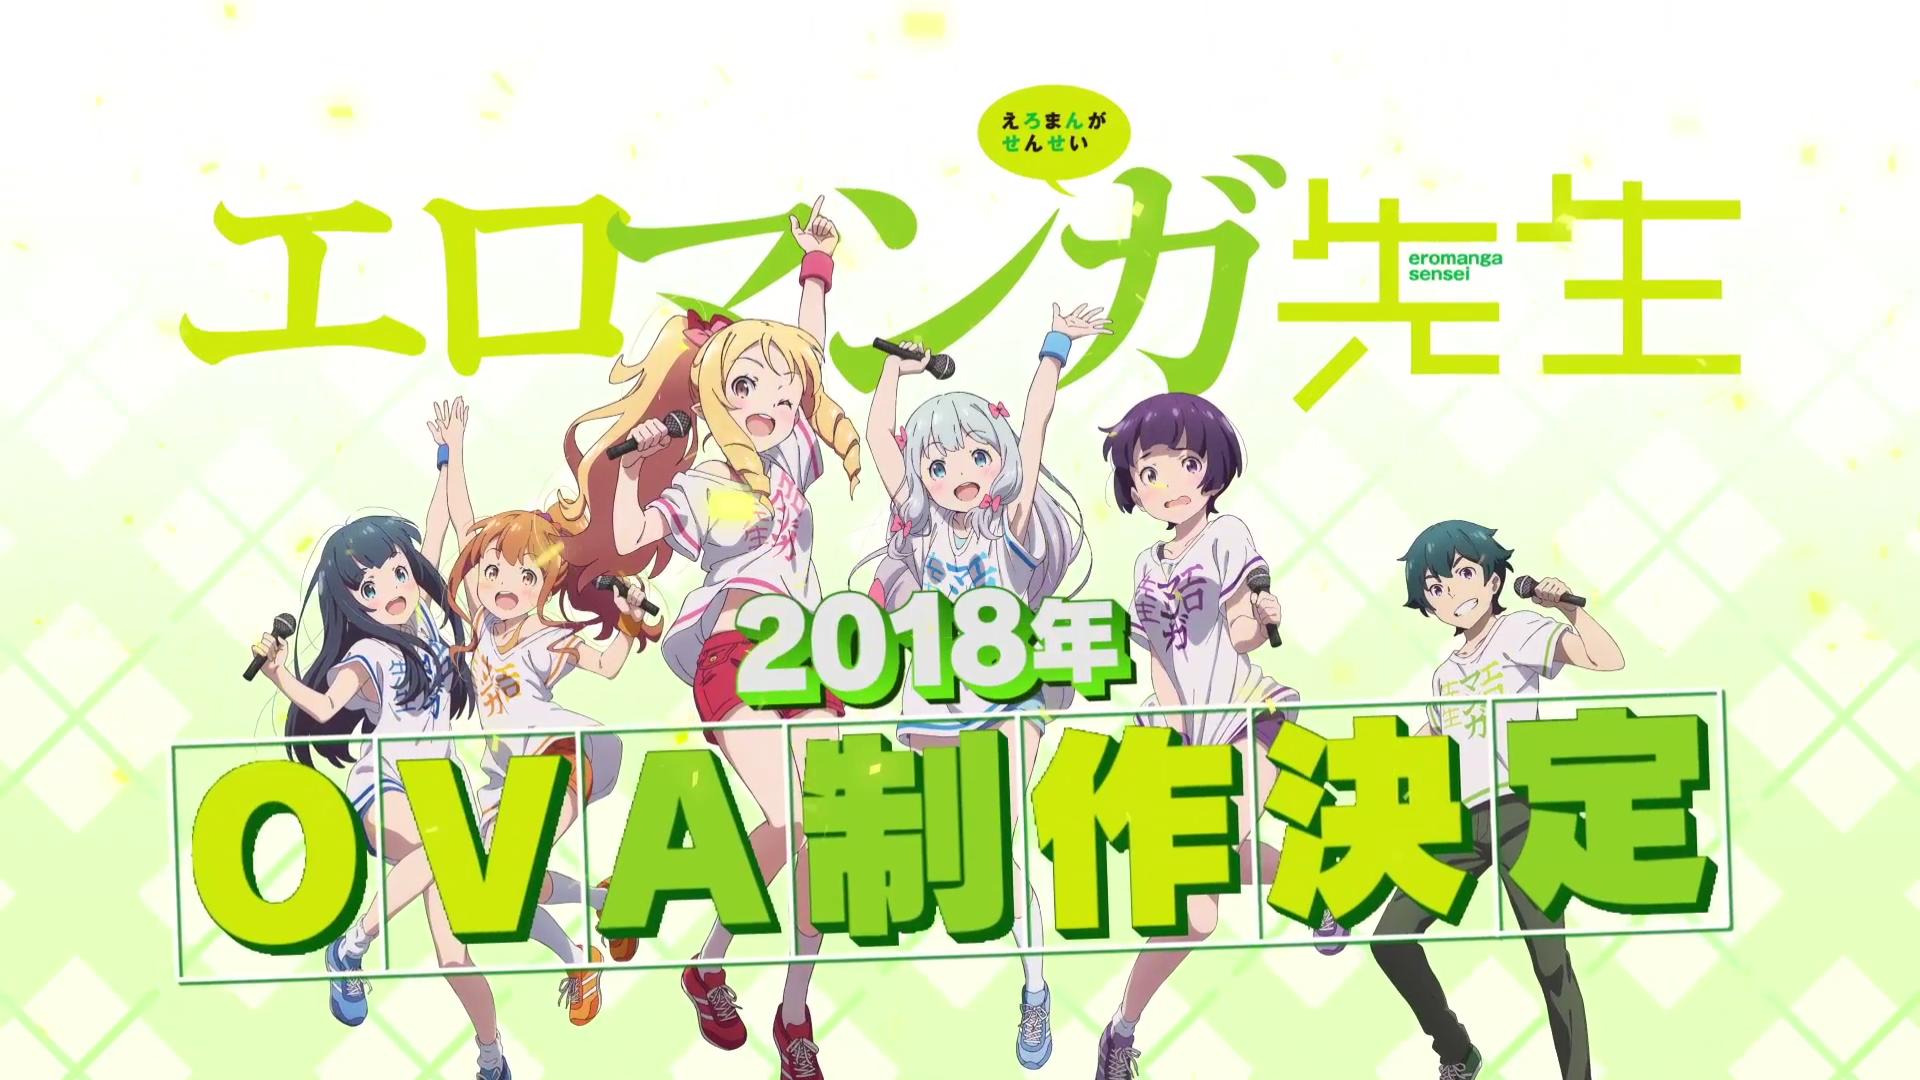 Cover image of Ero Manga Sensei - OVA